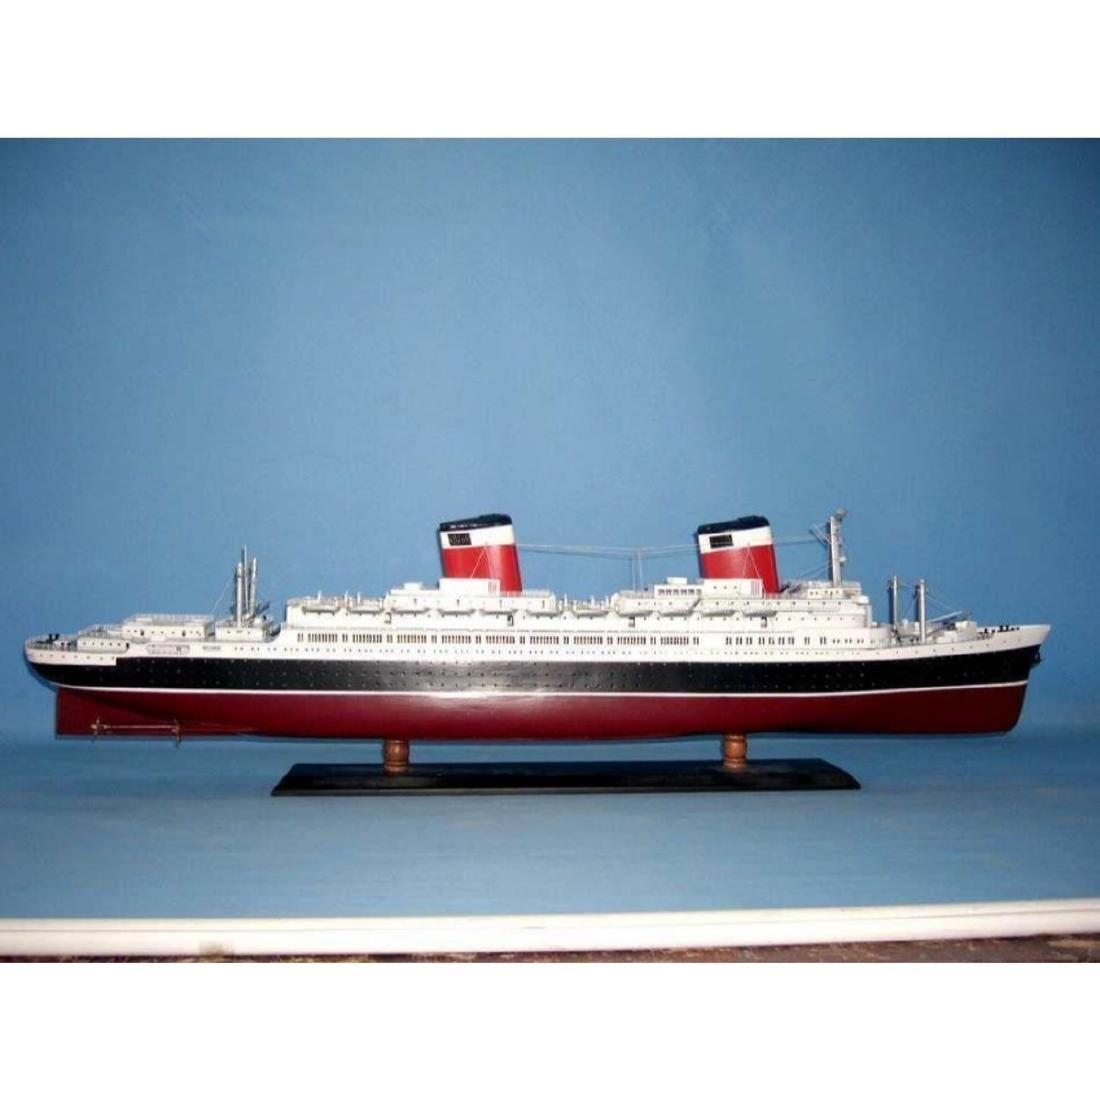 "SS United States Limited Model Cruise Ship 40"" w/ LED - 4"